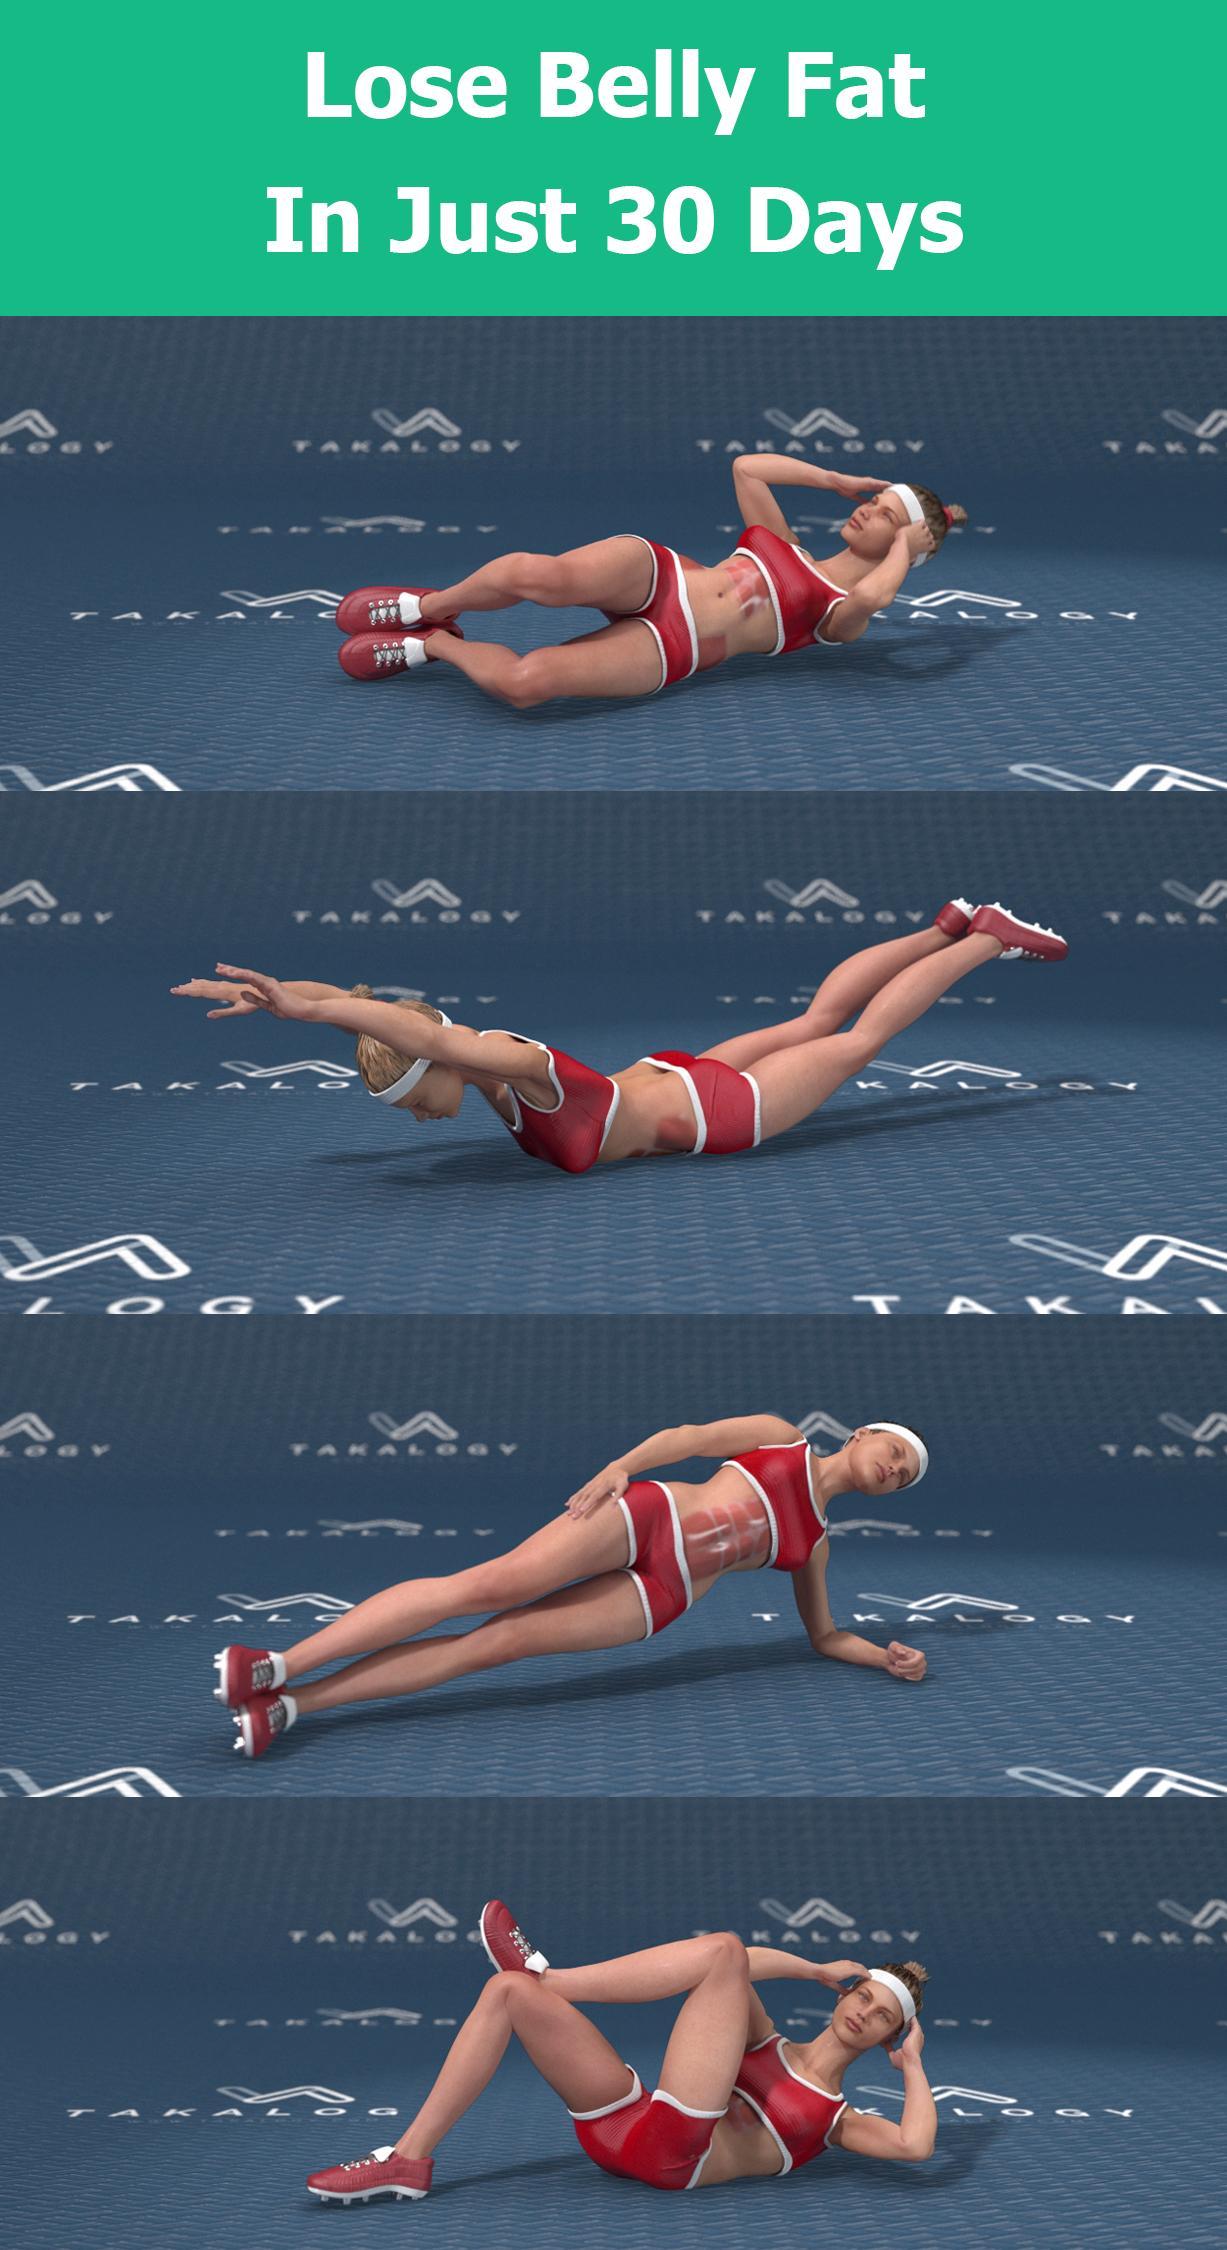 Lose Belly Fat Home Workout Apk 1 2 6 Download For Android Download Lose Belly Fat Home Workout Apk Latest Version Apkfab Com